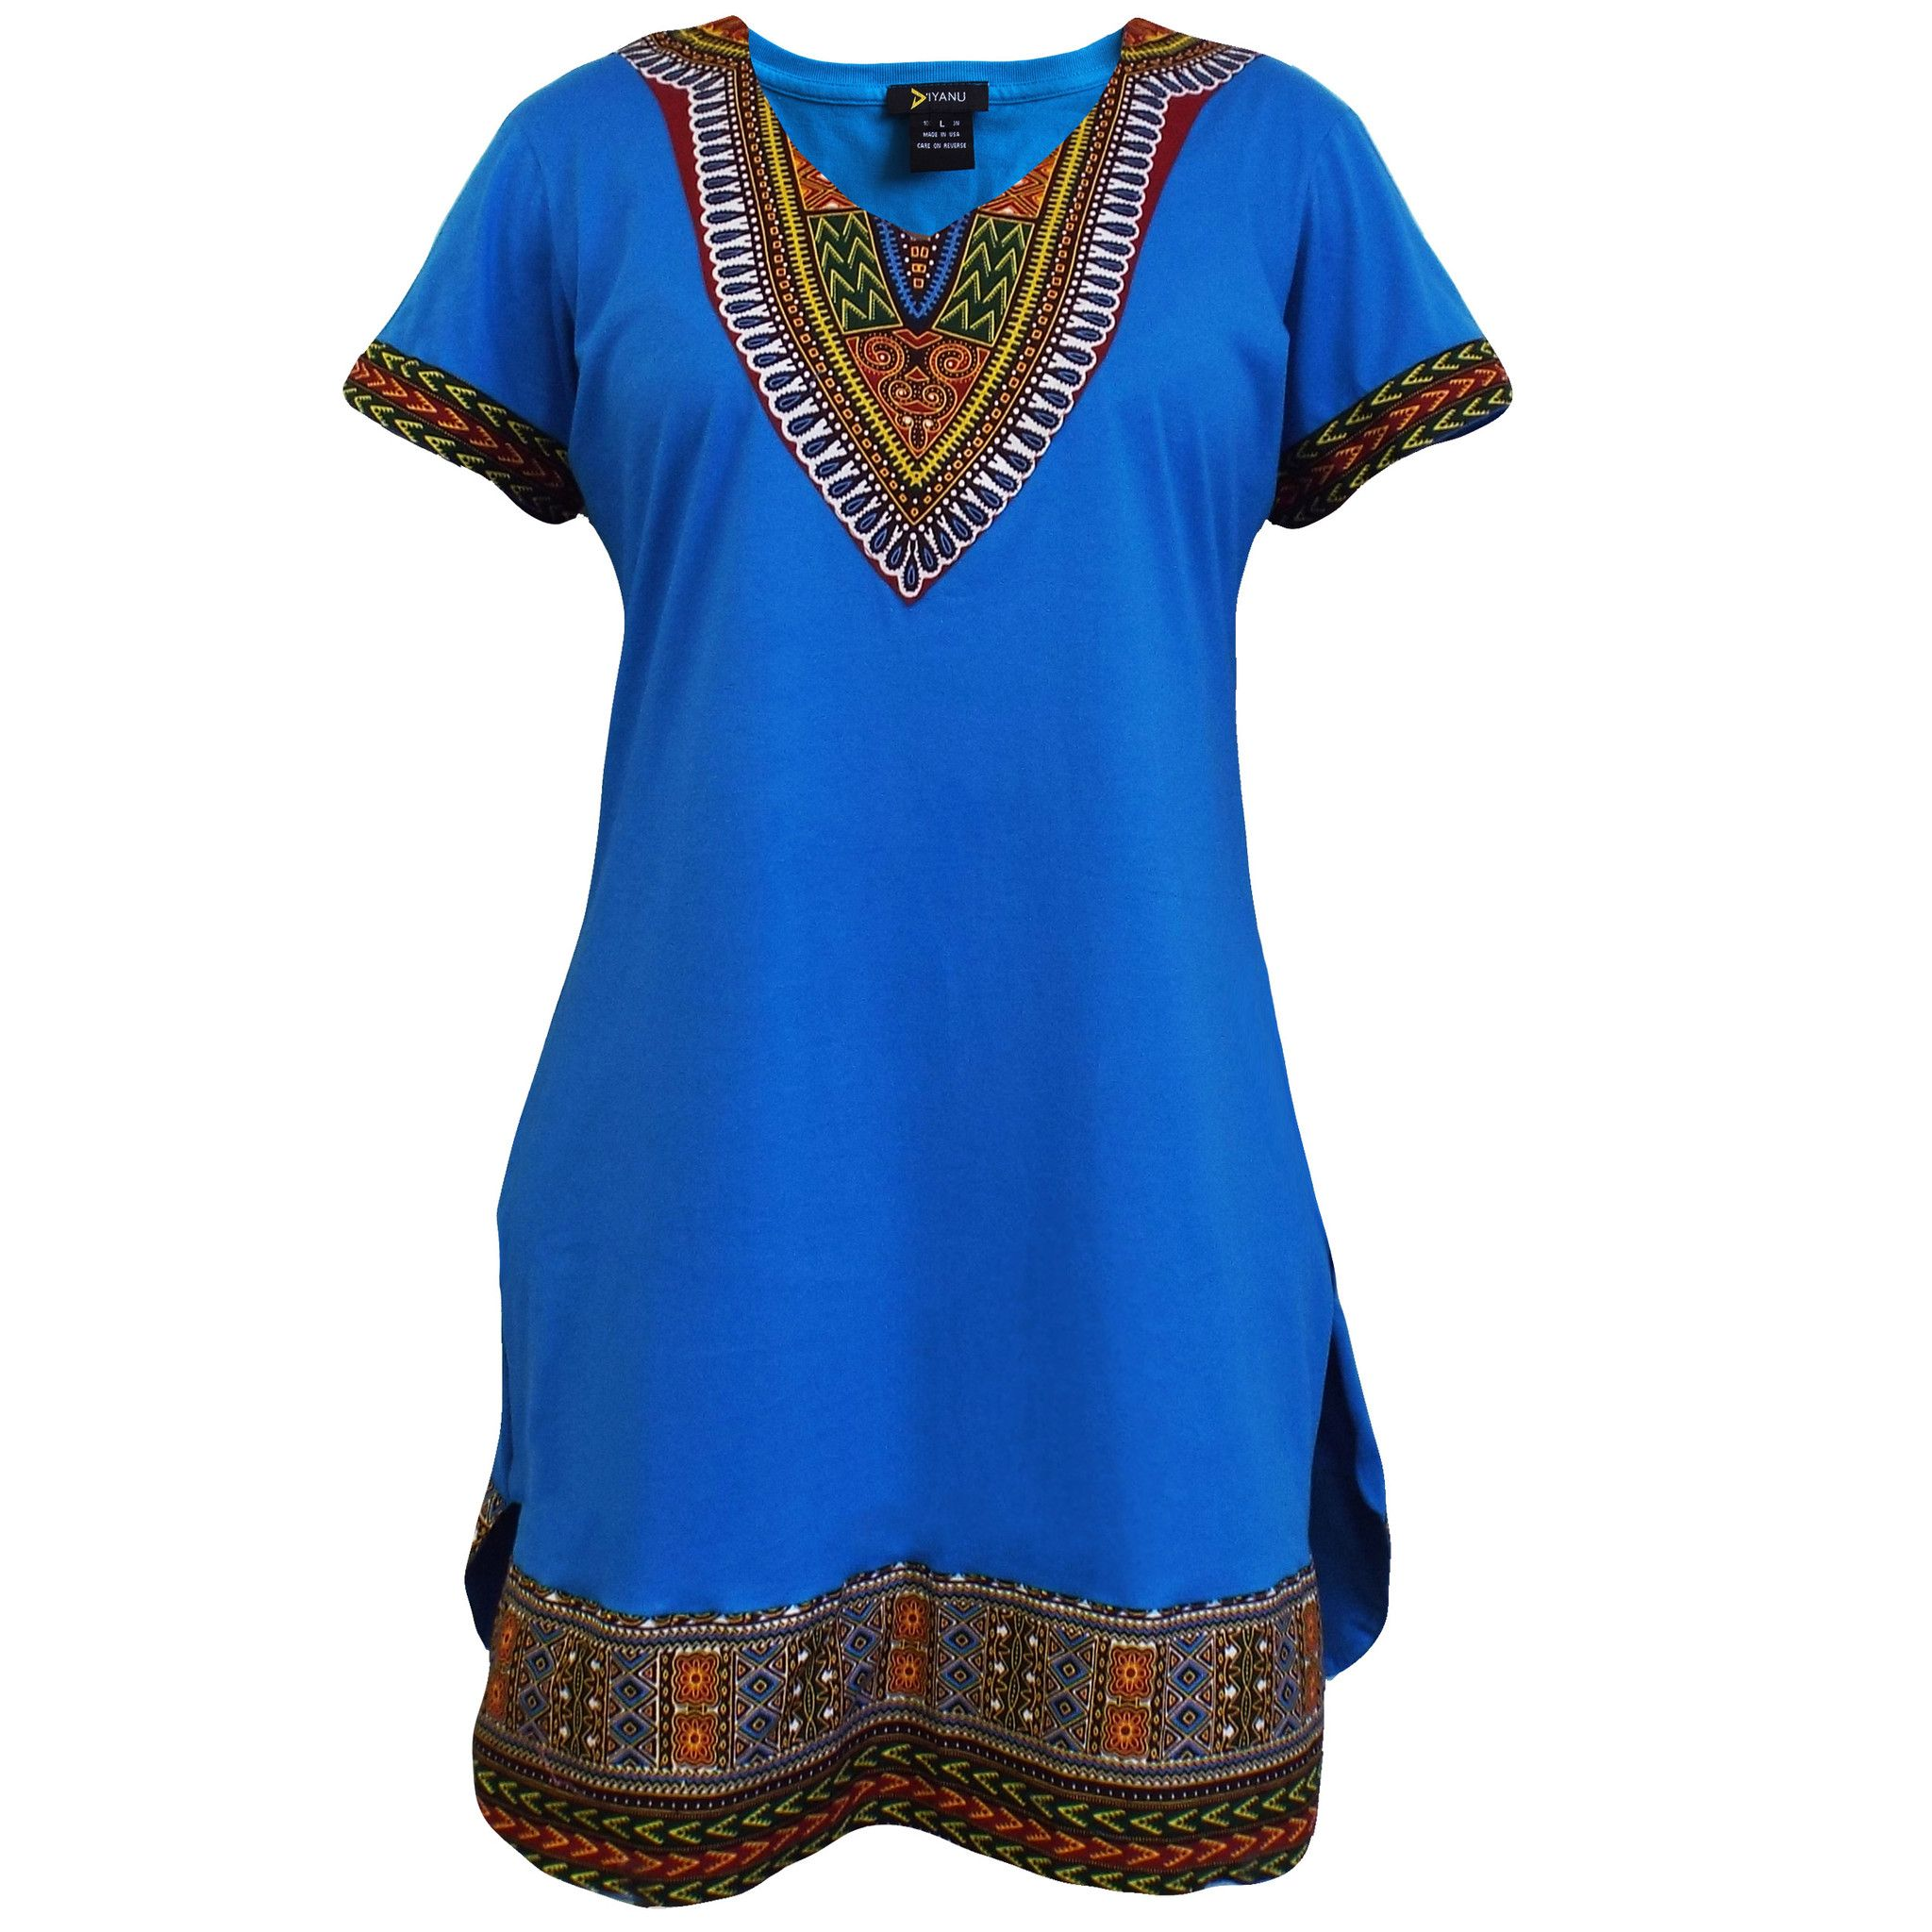 3a8d6f05dcb Women s Dashiki African Print T-Shirt Dress (Aqua Blue)